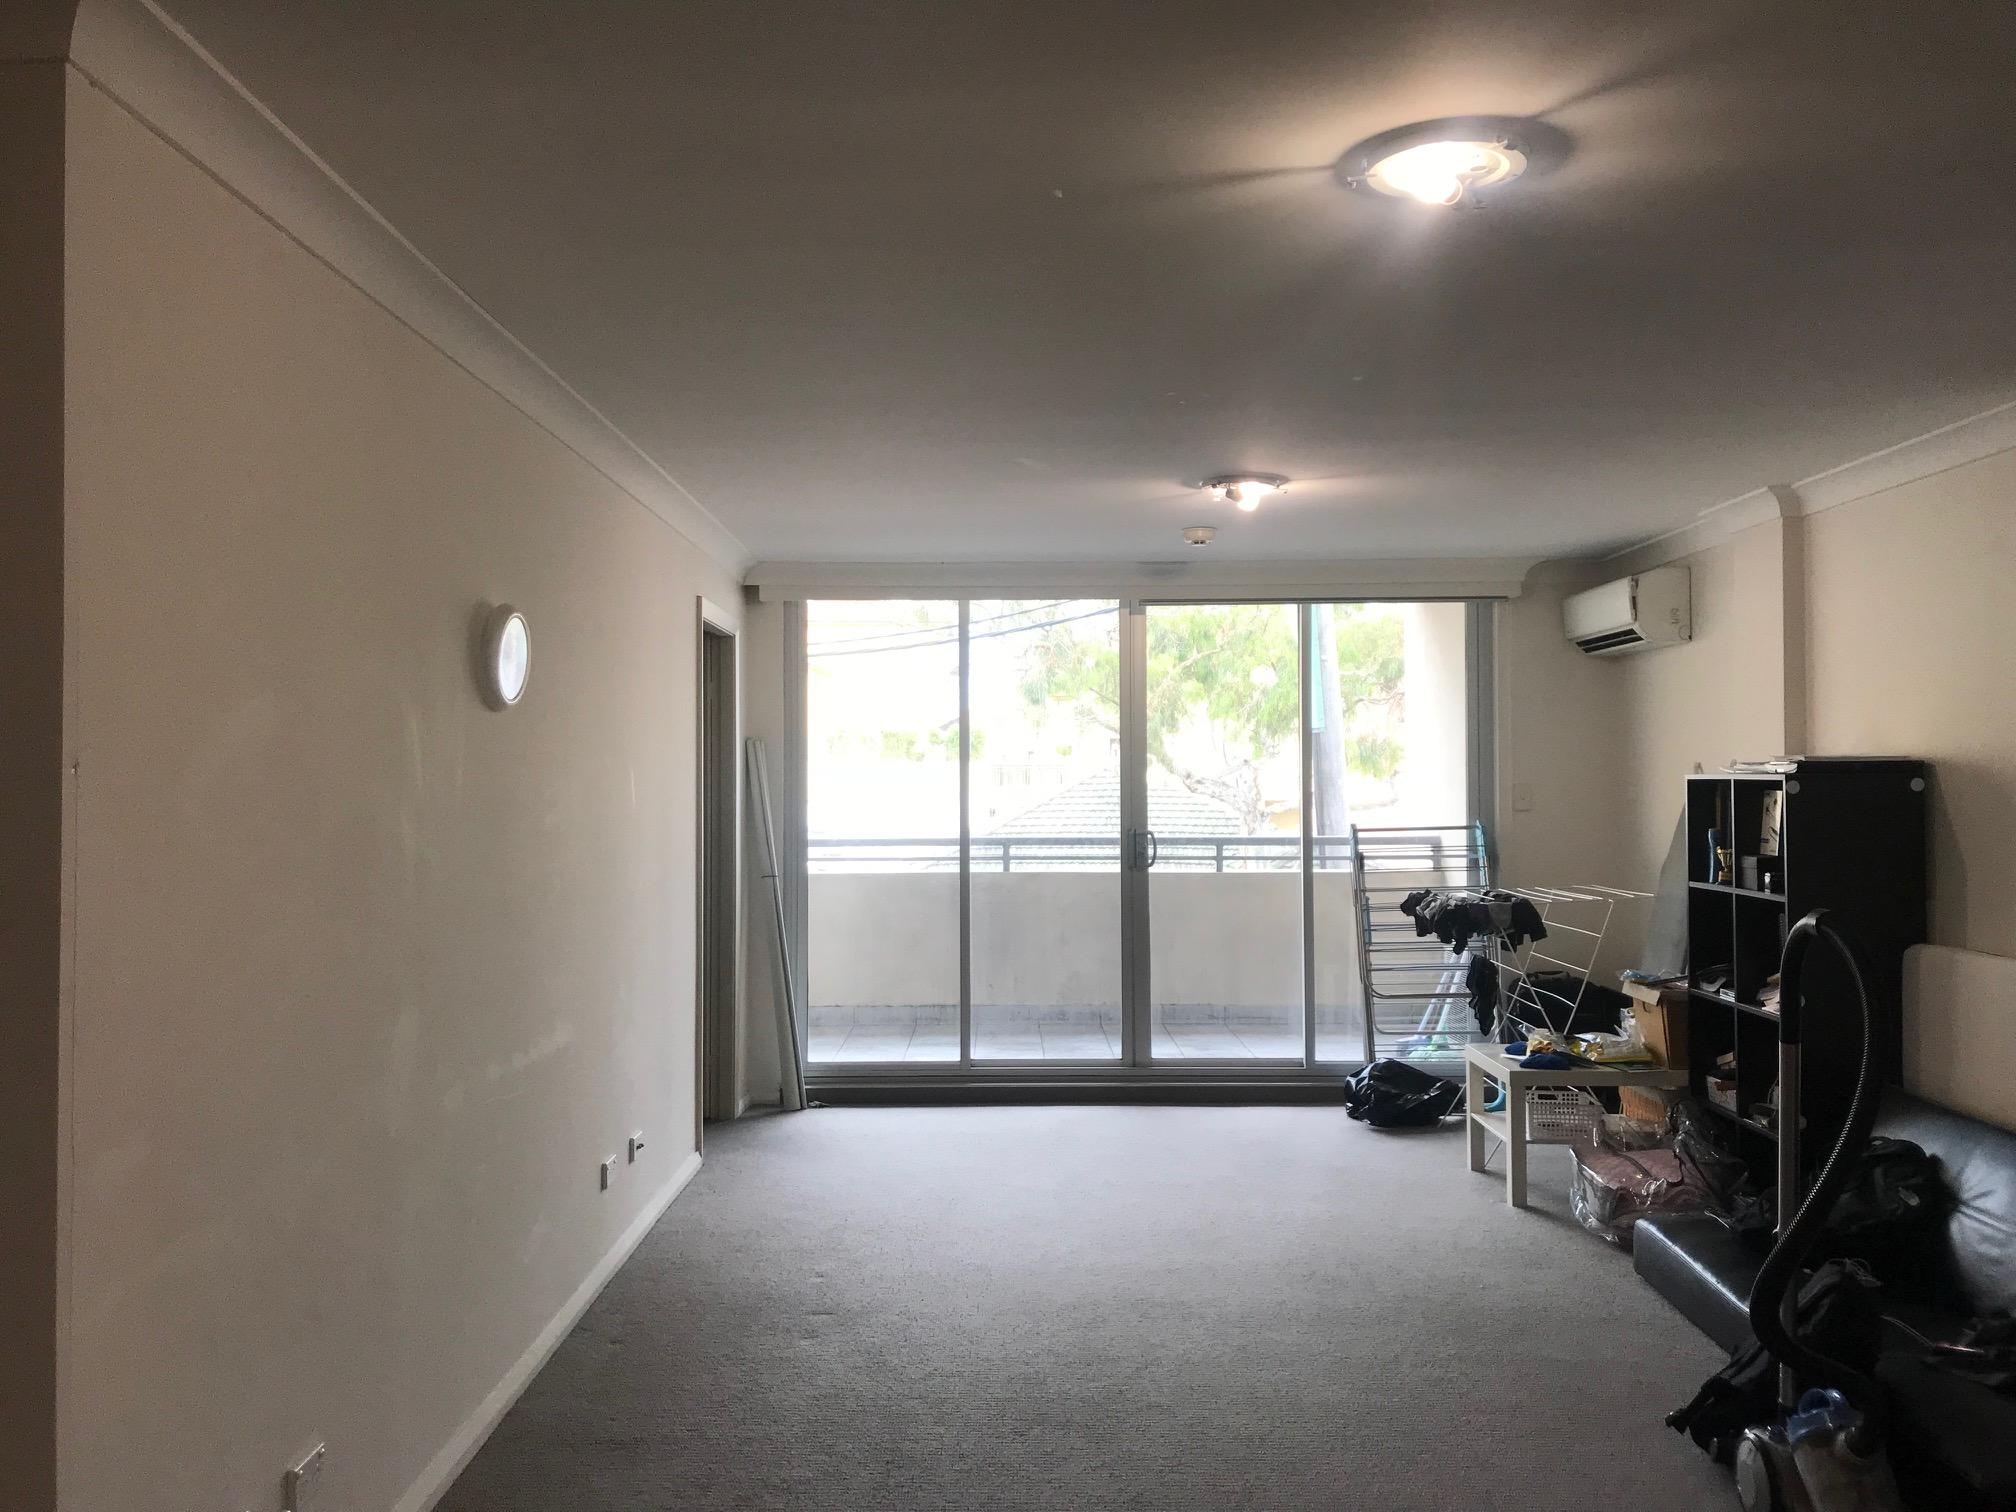 2 Bedroom Apartment in Convenient Location DEPOSIT RECEIVED